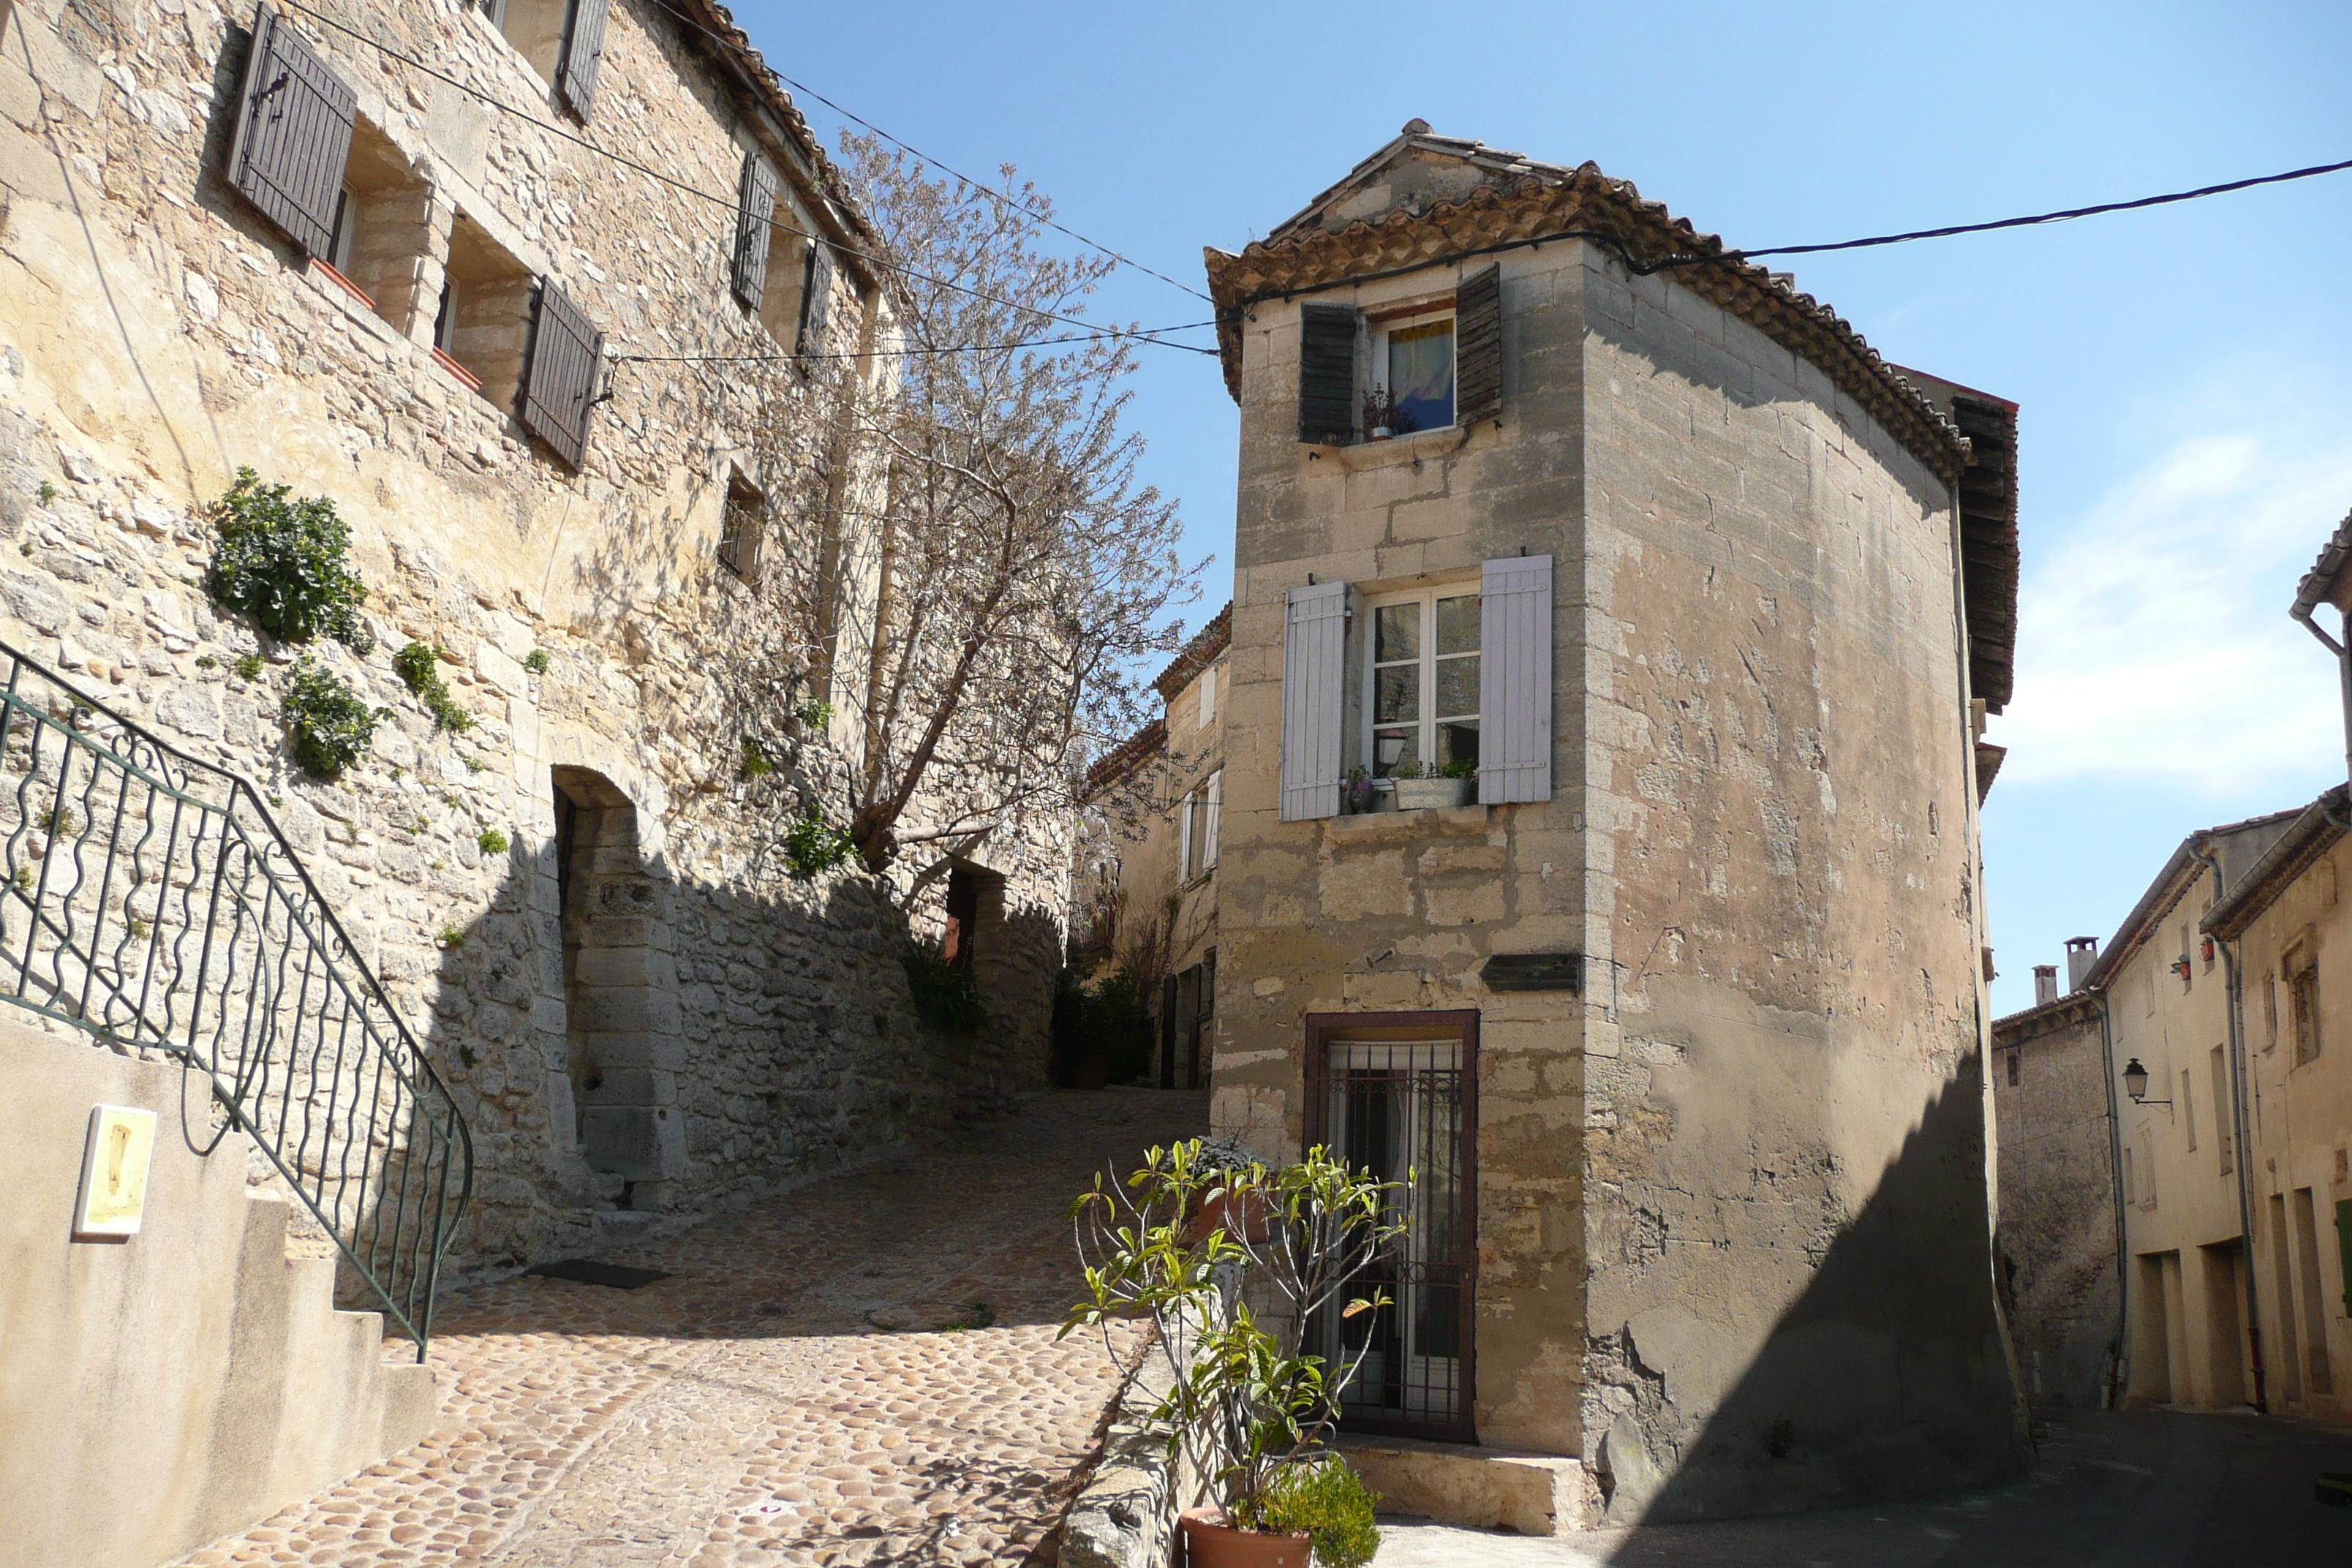 https://upload.wikimedia.org/wikipedia/commons/4/45/Vieux_village,_Les_Angles_2.JPG